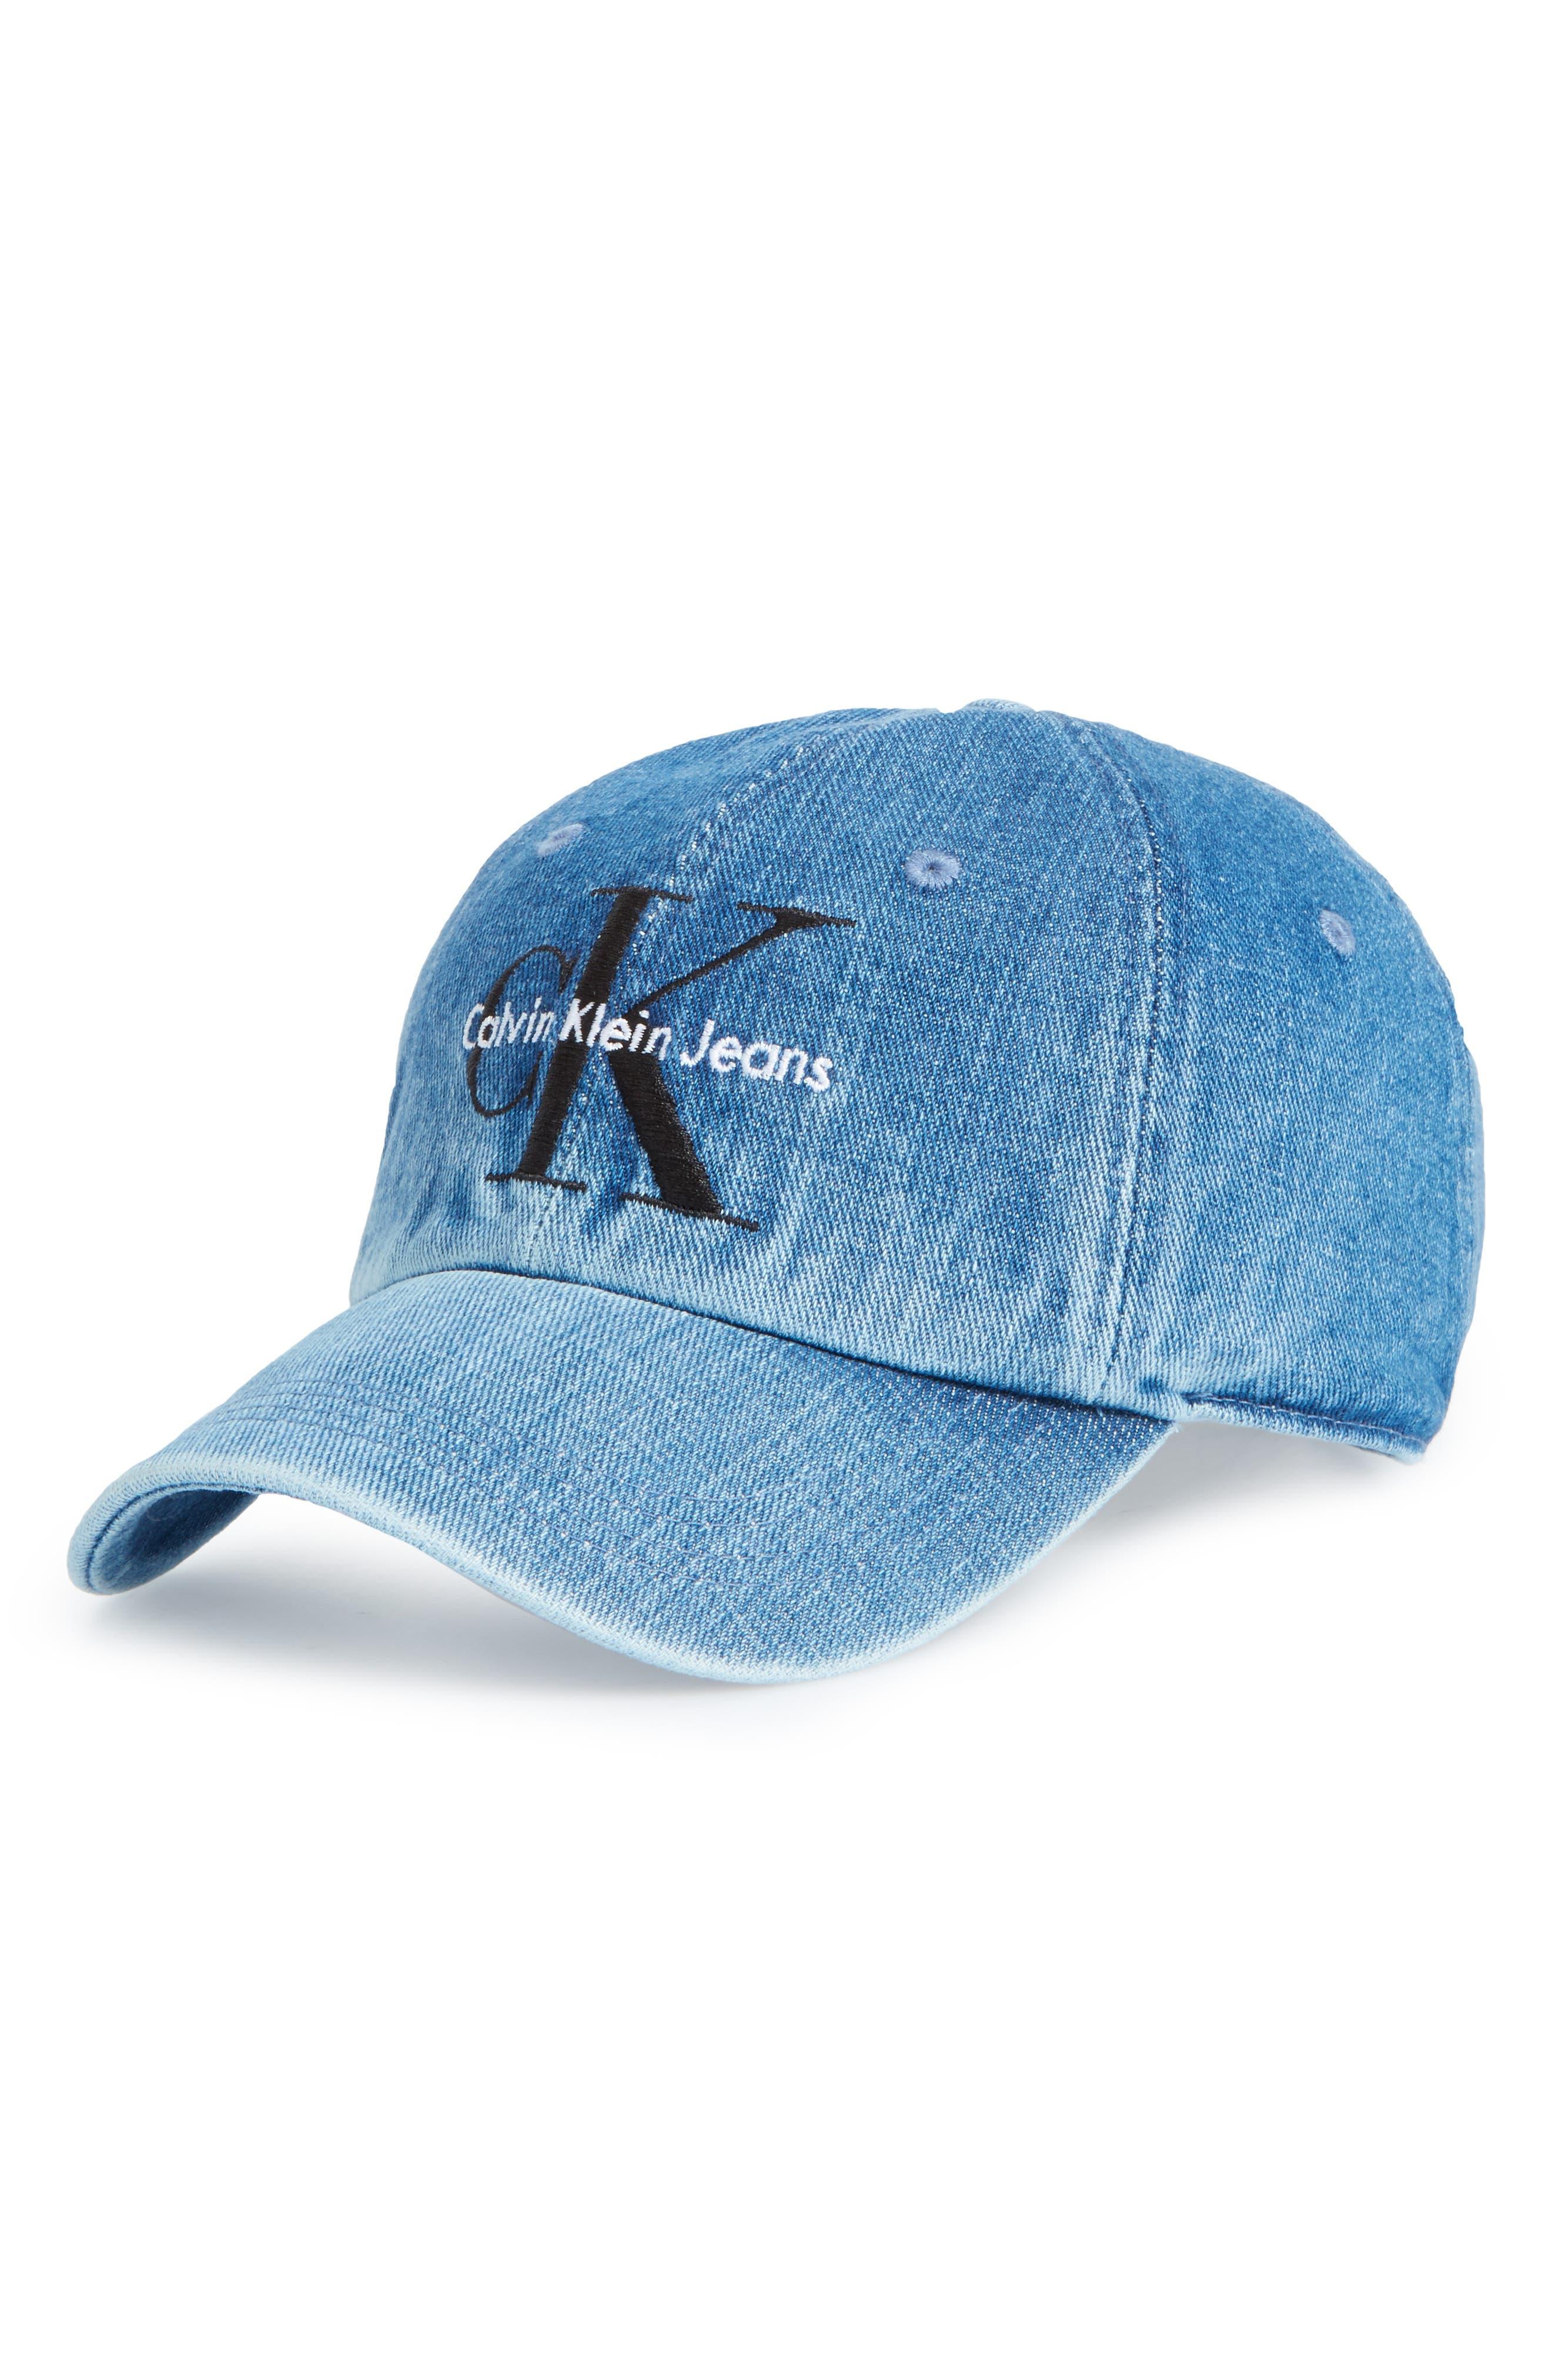 Calvin Klein CK Jeans Ball Cap,                             Main thumbnail 1, color,                             Stone Wash